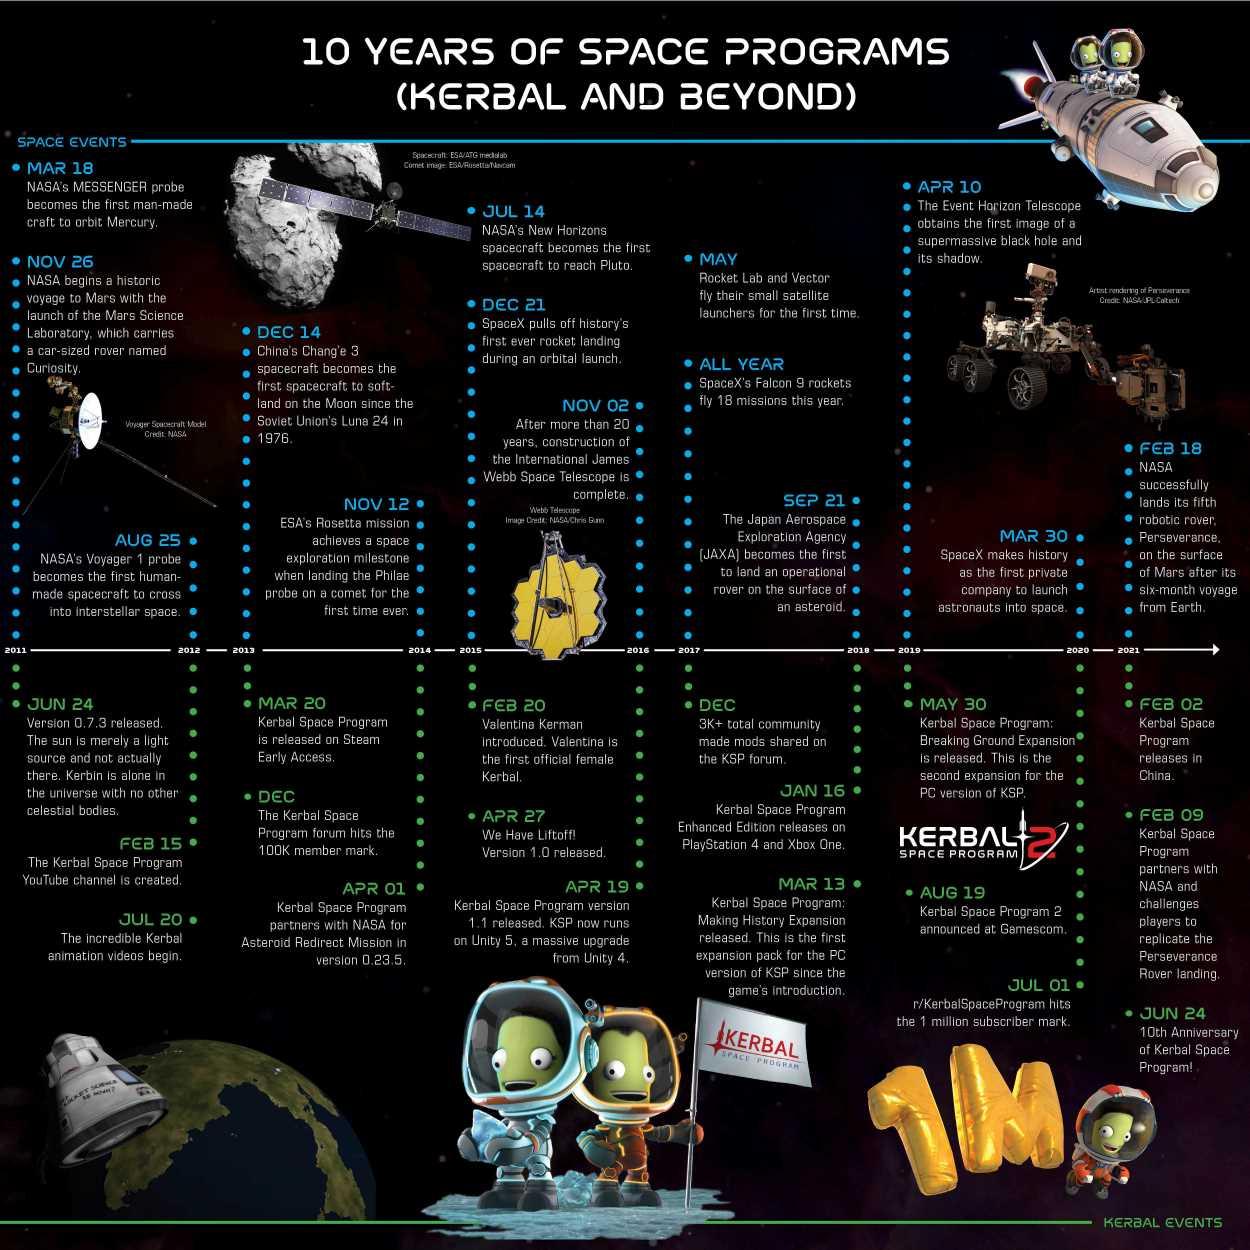 Kerbal Space Program 10thAnniversary